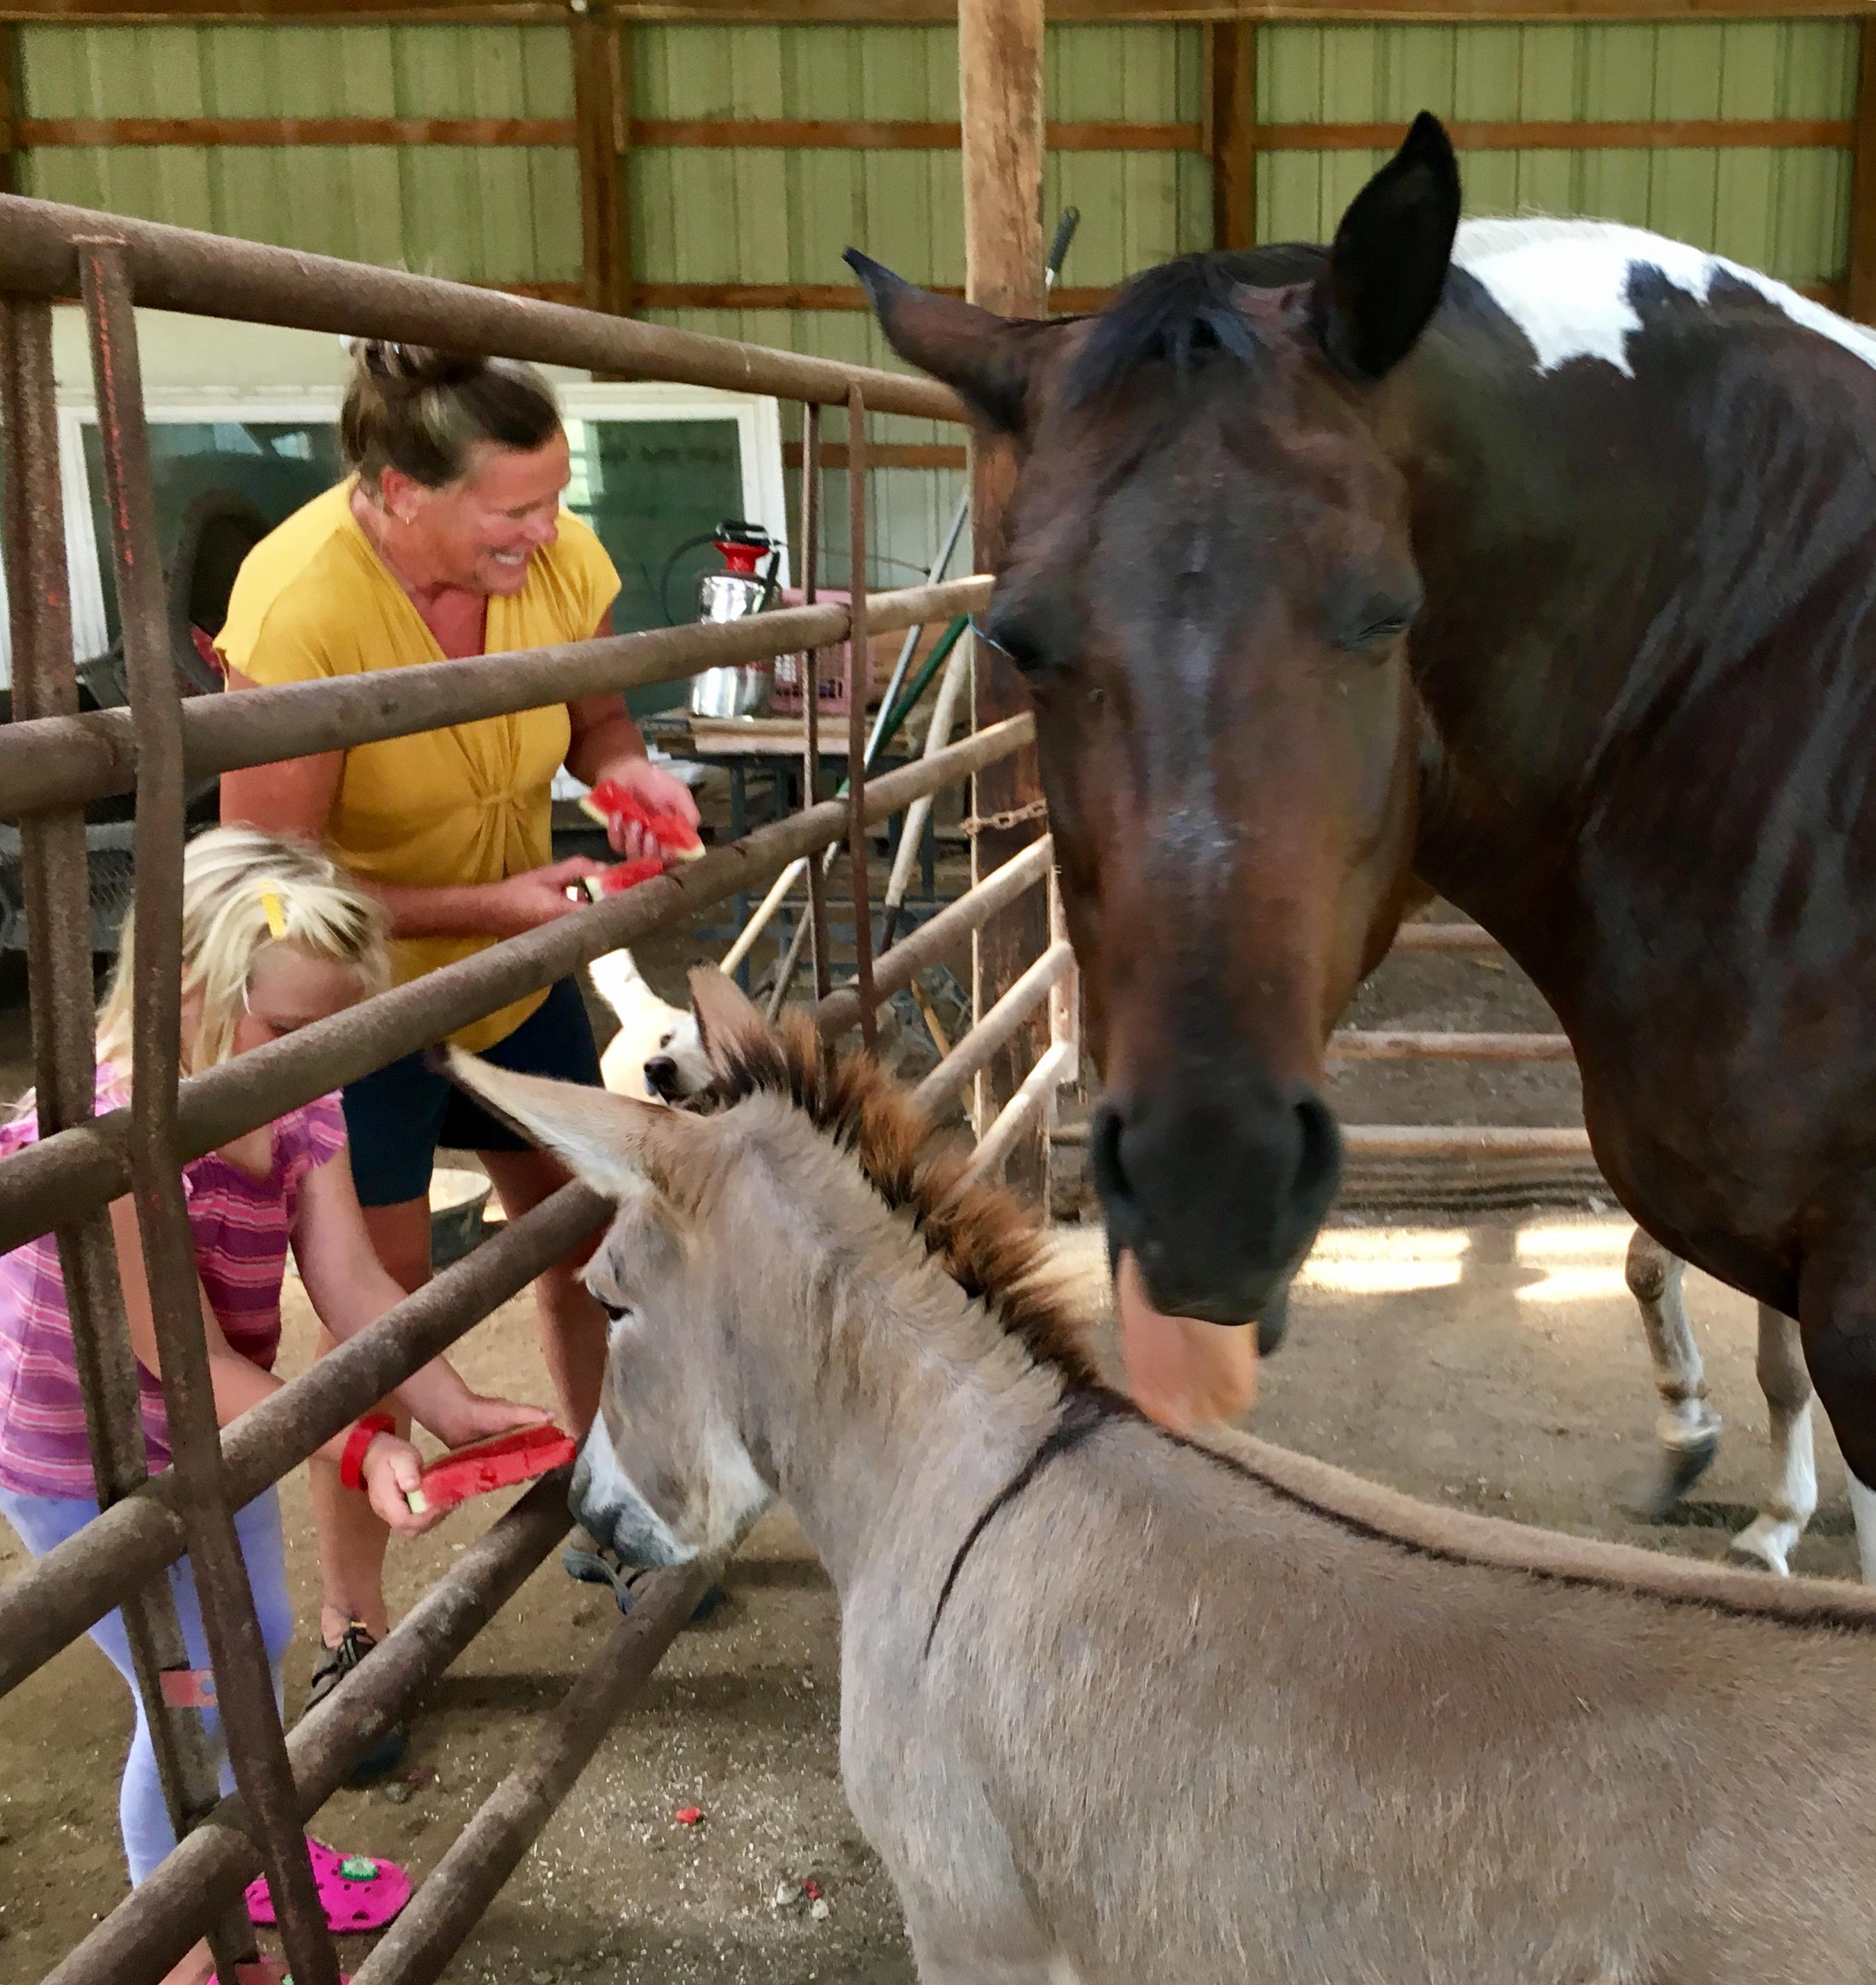 feeding horses with watermellon